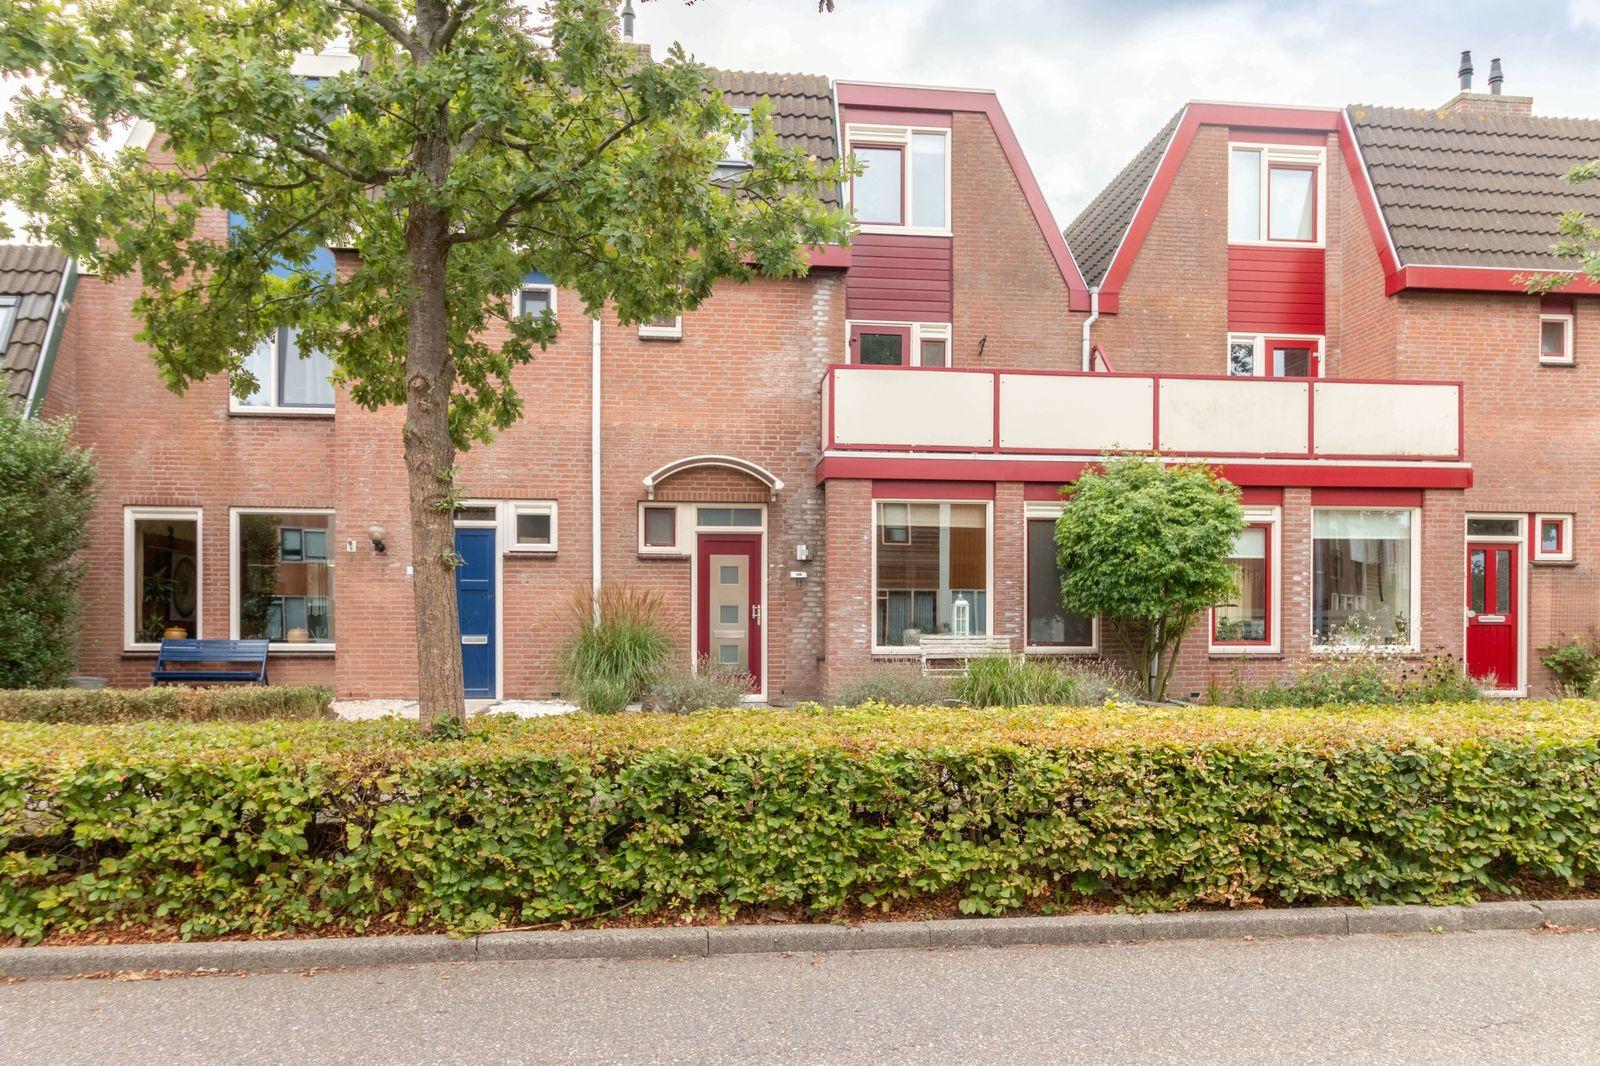 Kolkgriend 13, Almere